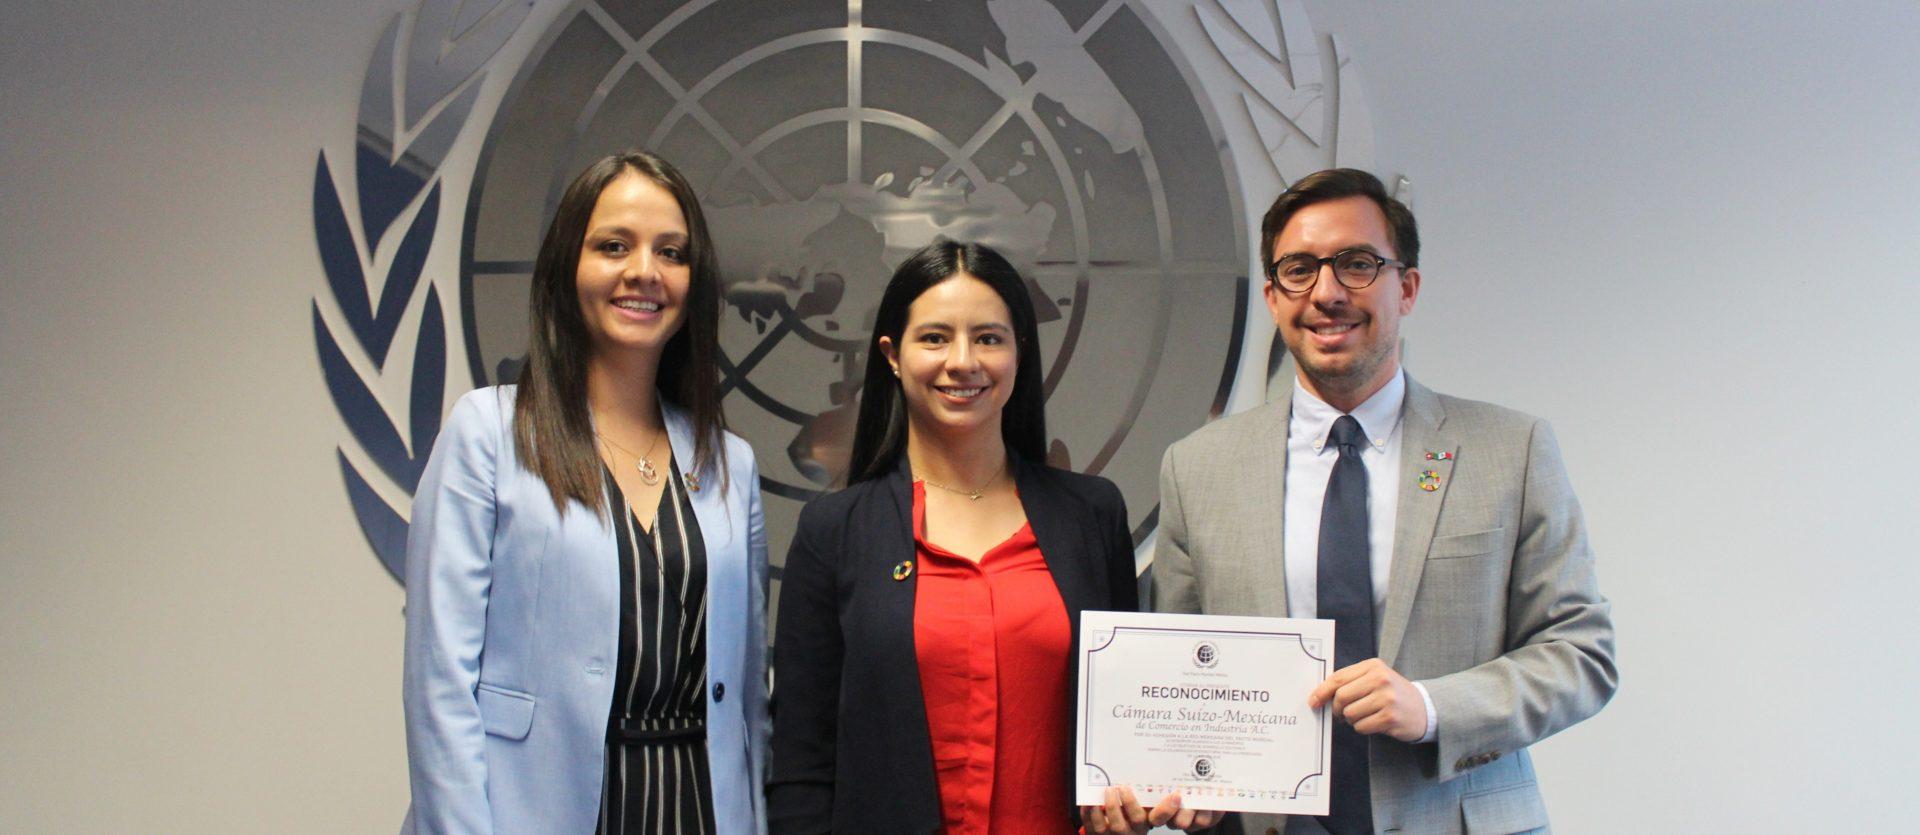 SwissCham becomes member of the UN Global Compact